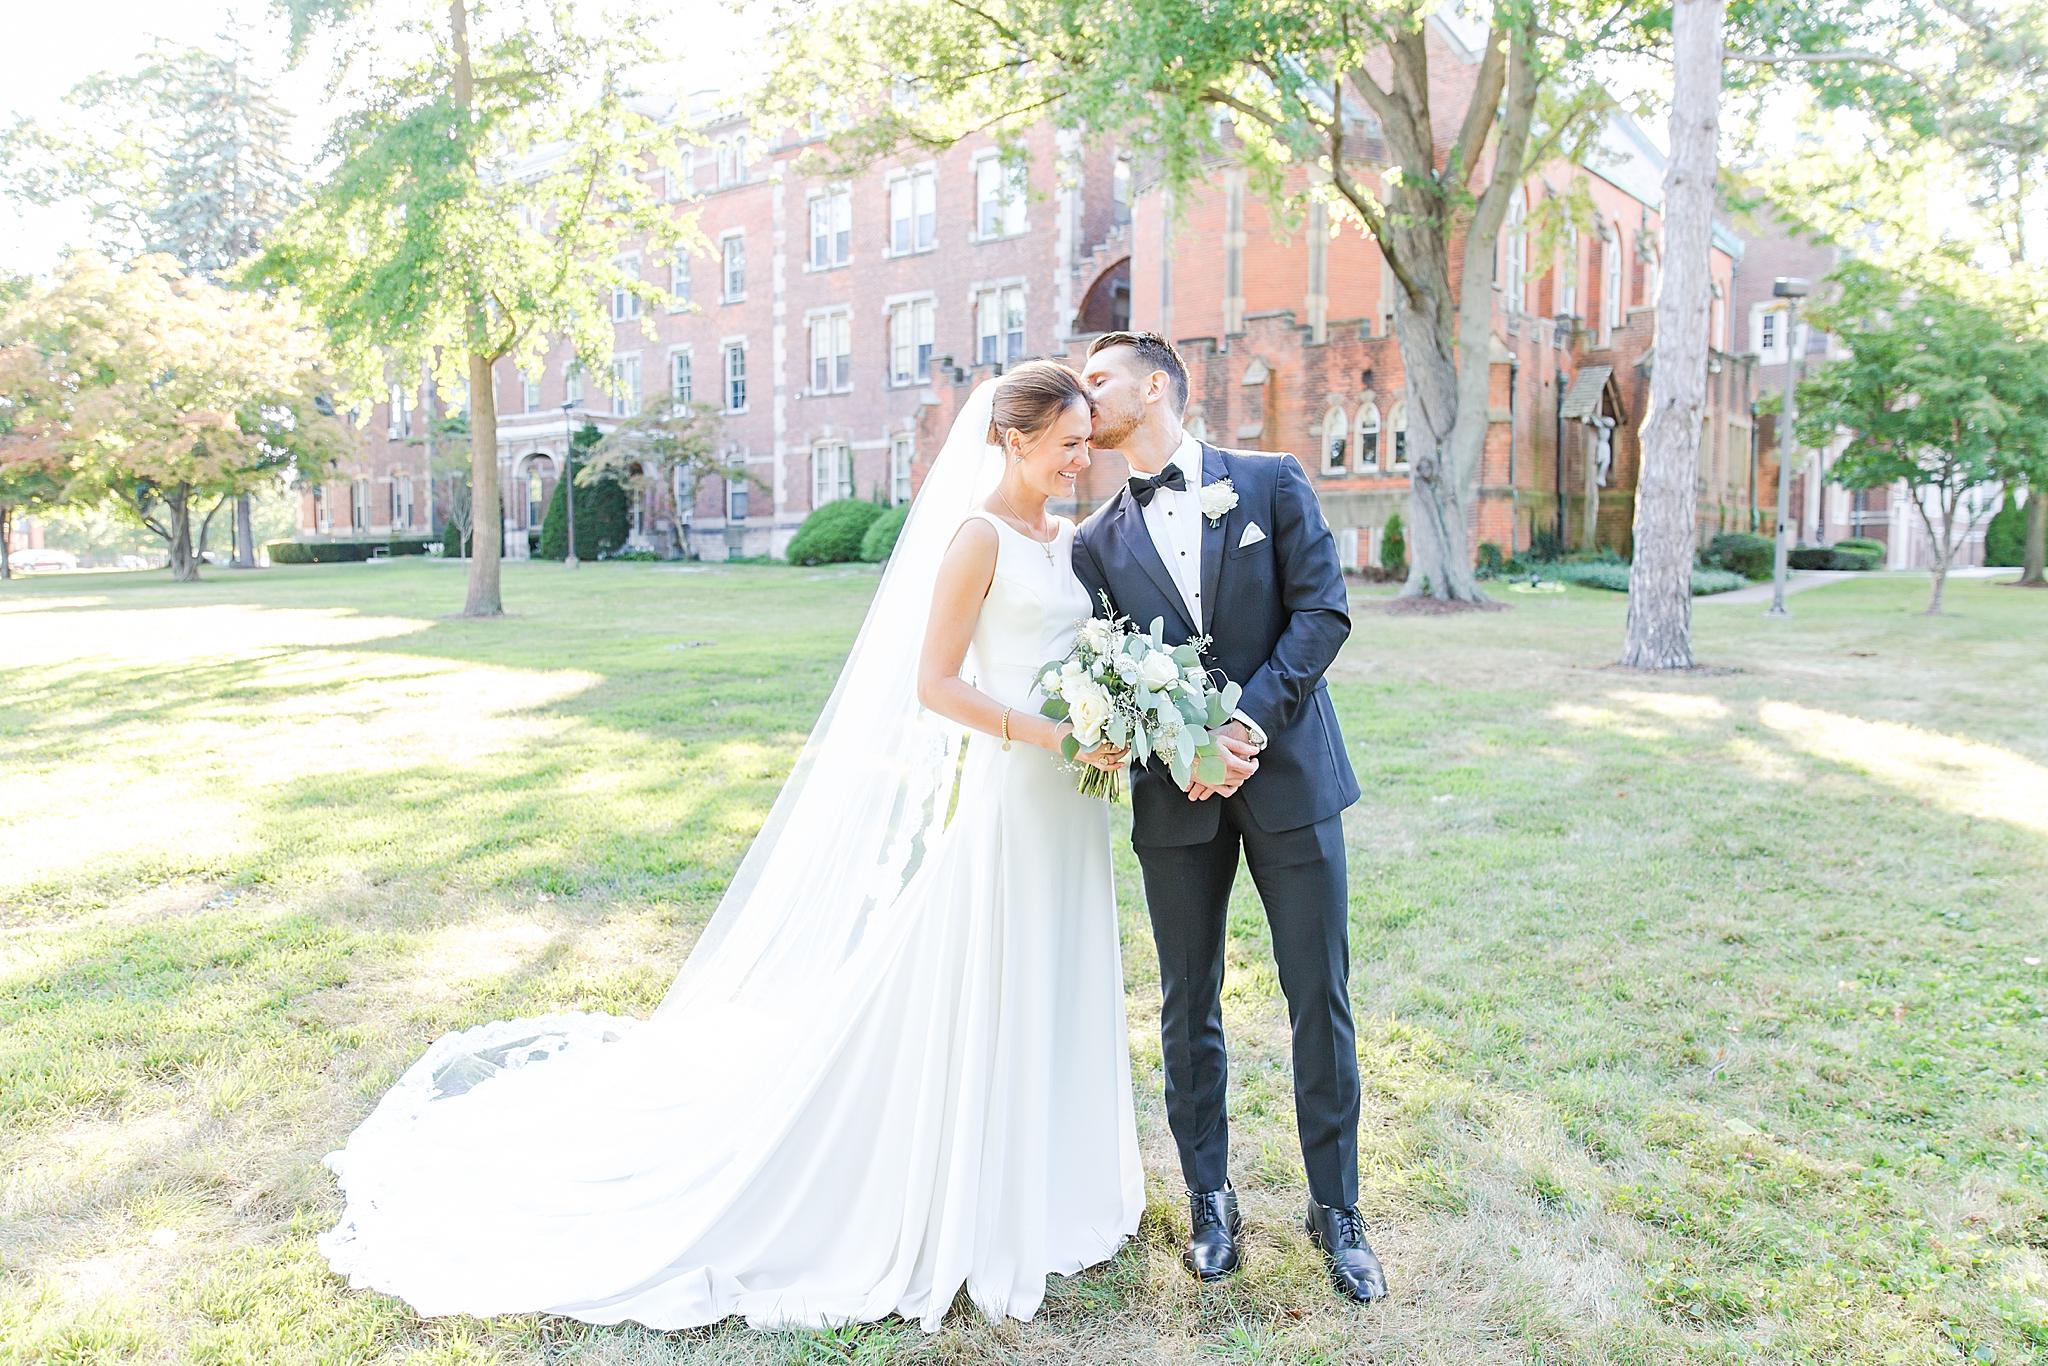 detroit-wedding-photographer-grosse-pointe-academy-chapel-detroit-golf-club-wedding-carly-matt-by-courtney-carolyn-photography_0069.jpg